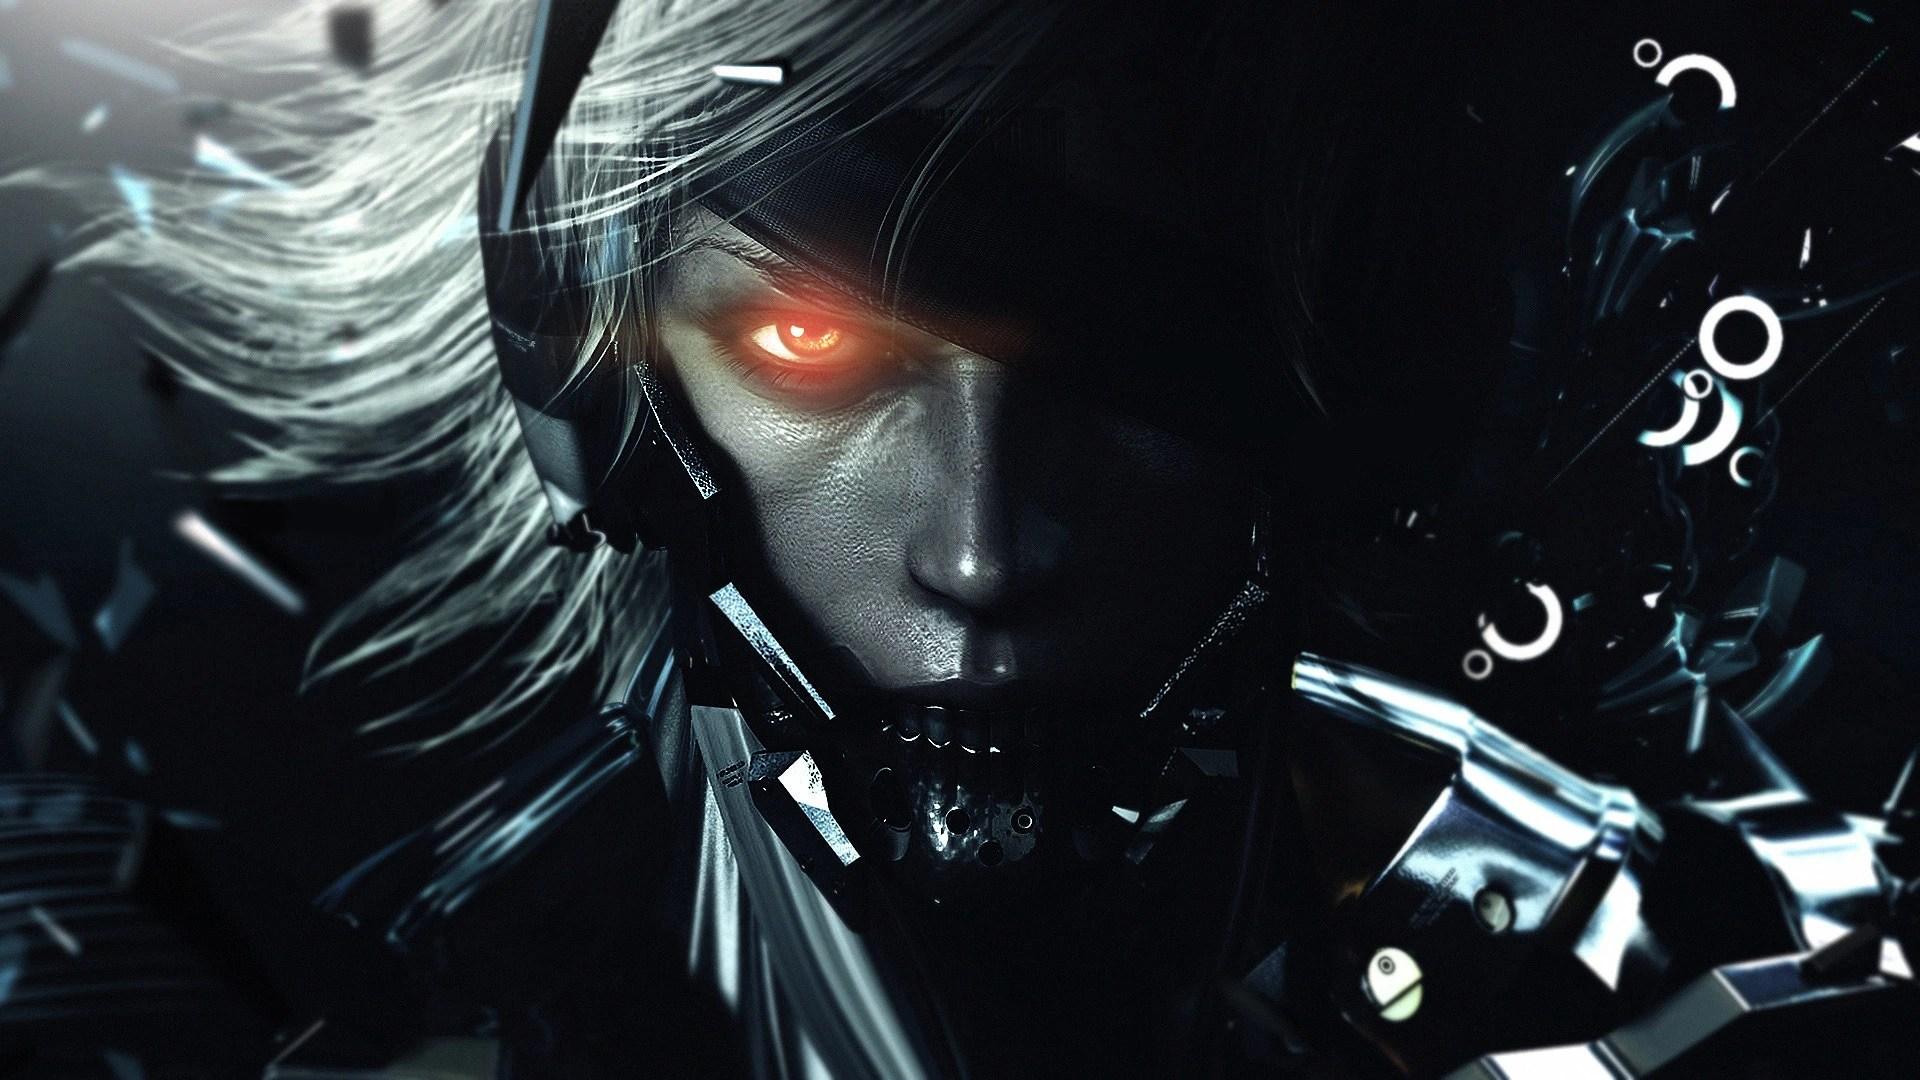 hero Black background